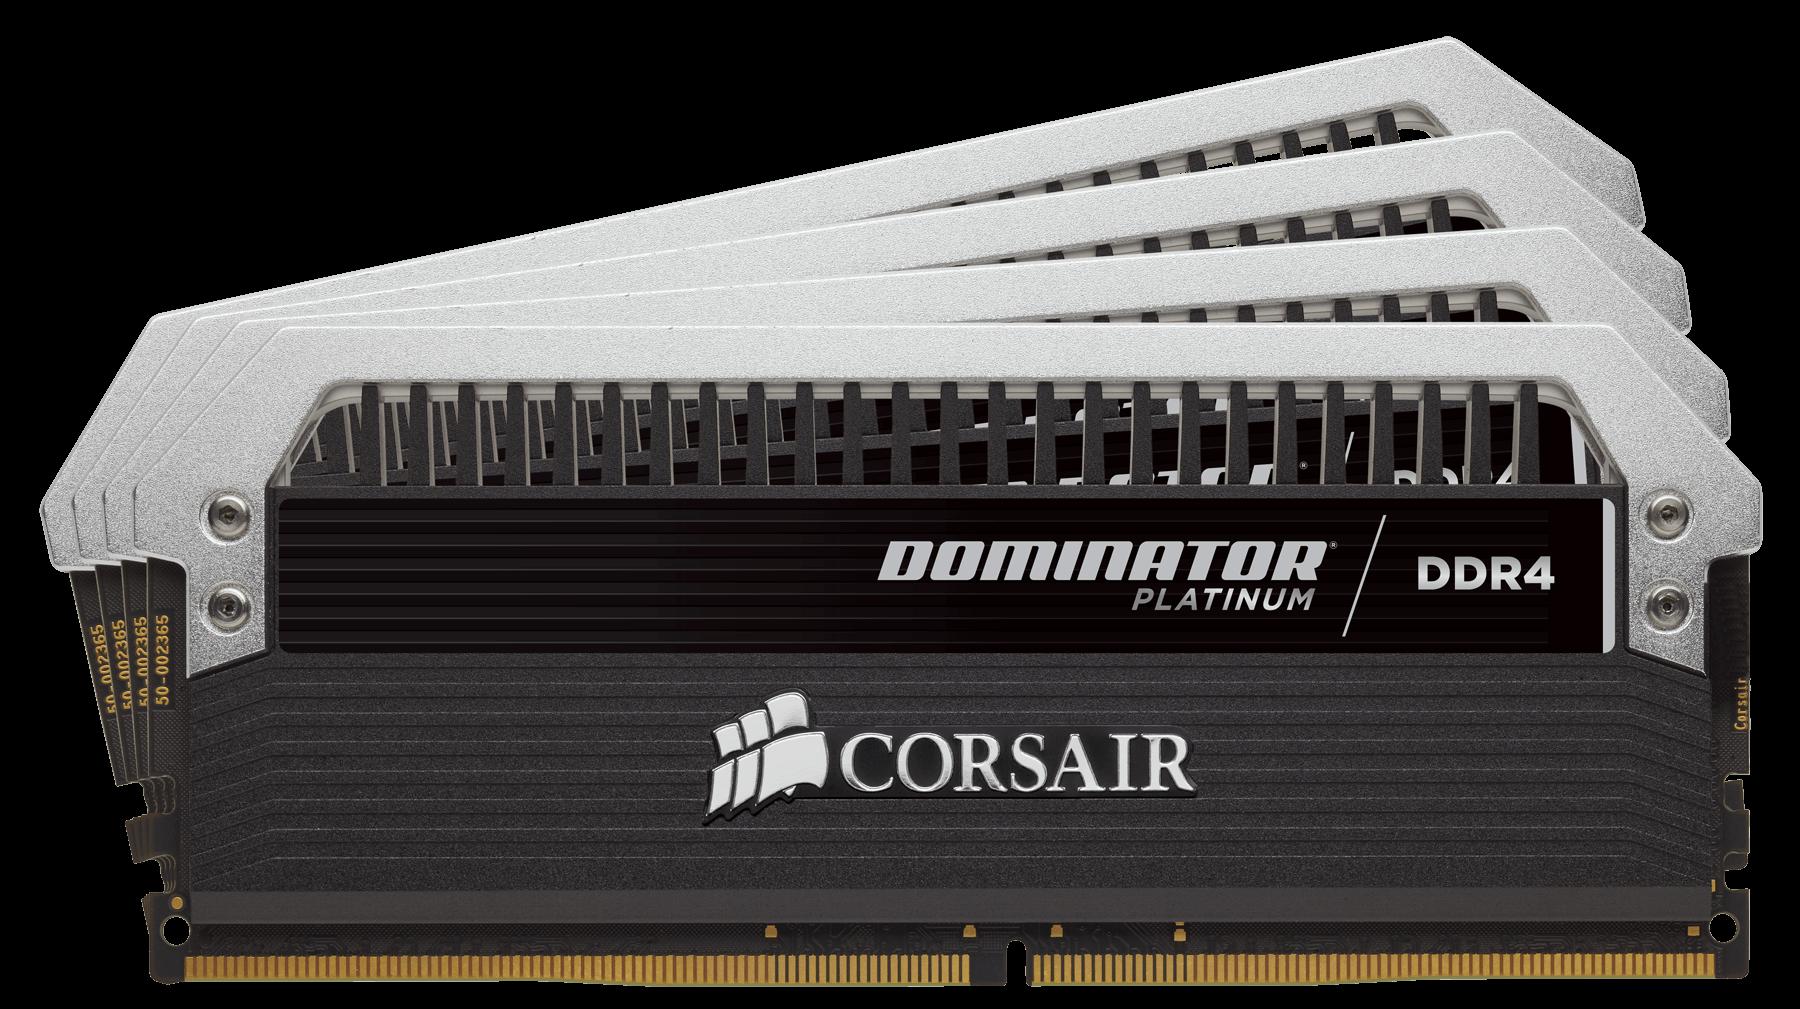 Corsair Dominator Platinum 64GB DDR4 2400MHz